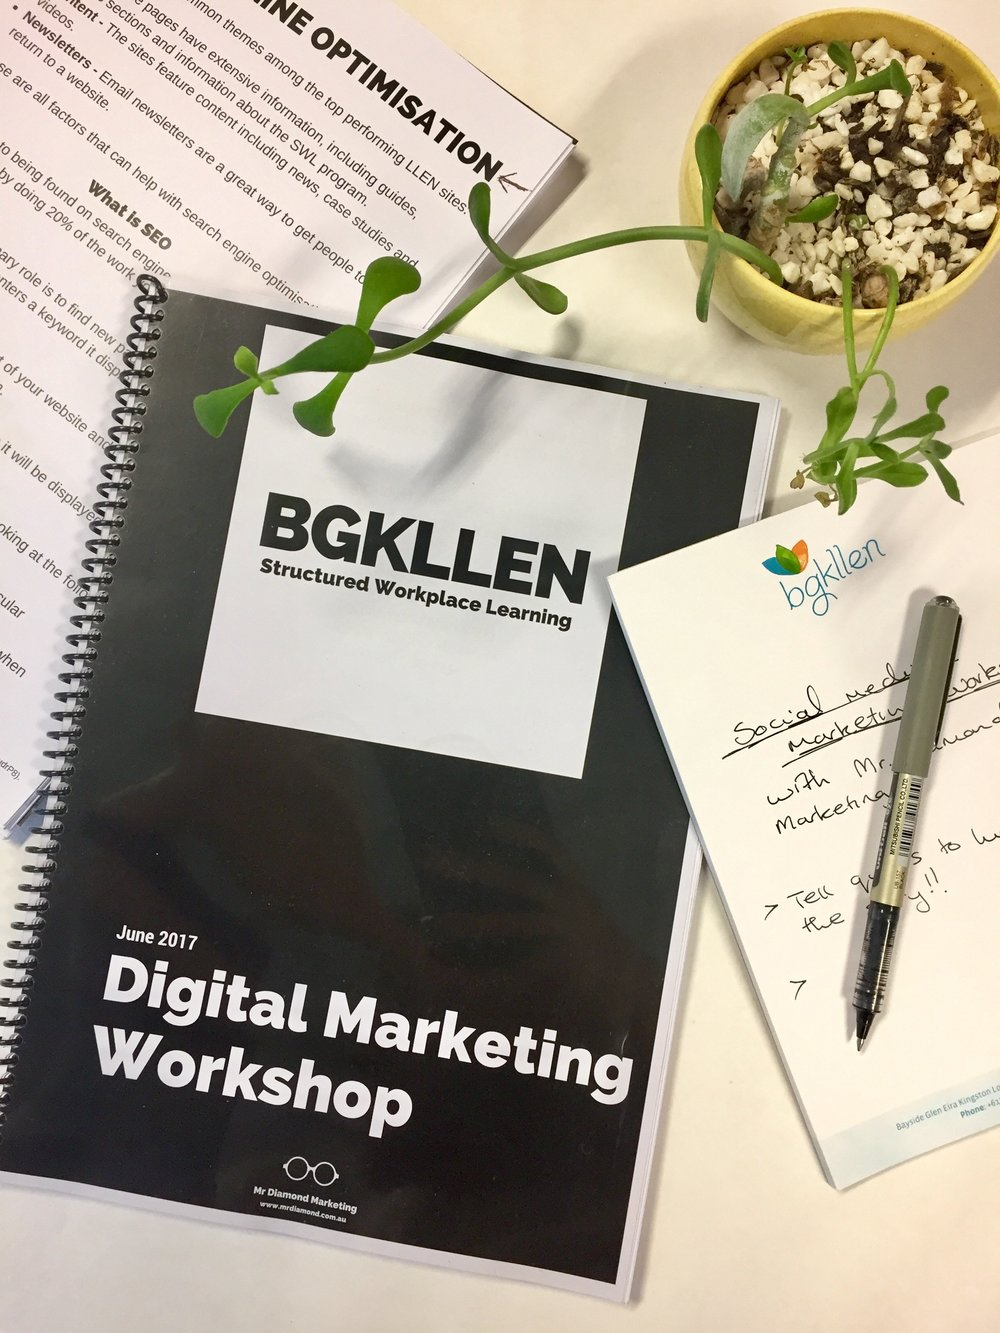 Digital Marketing Training For BGKLLEN